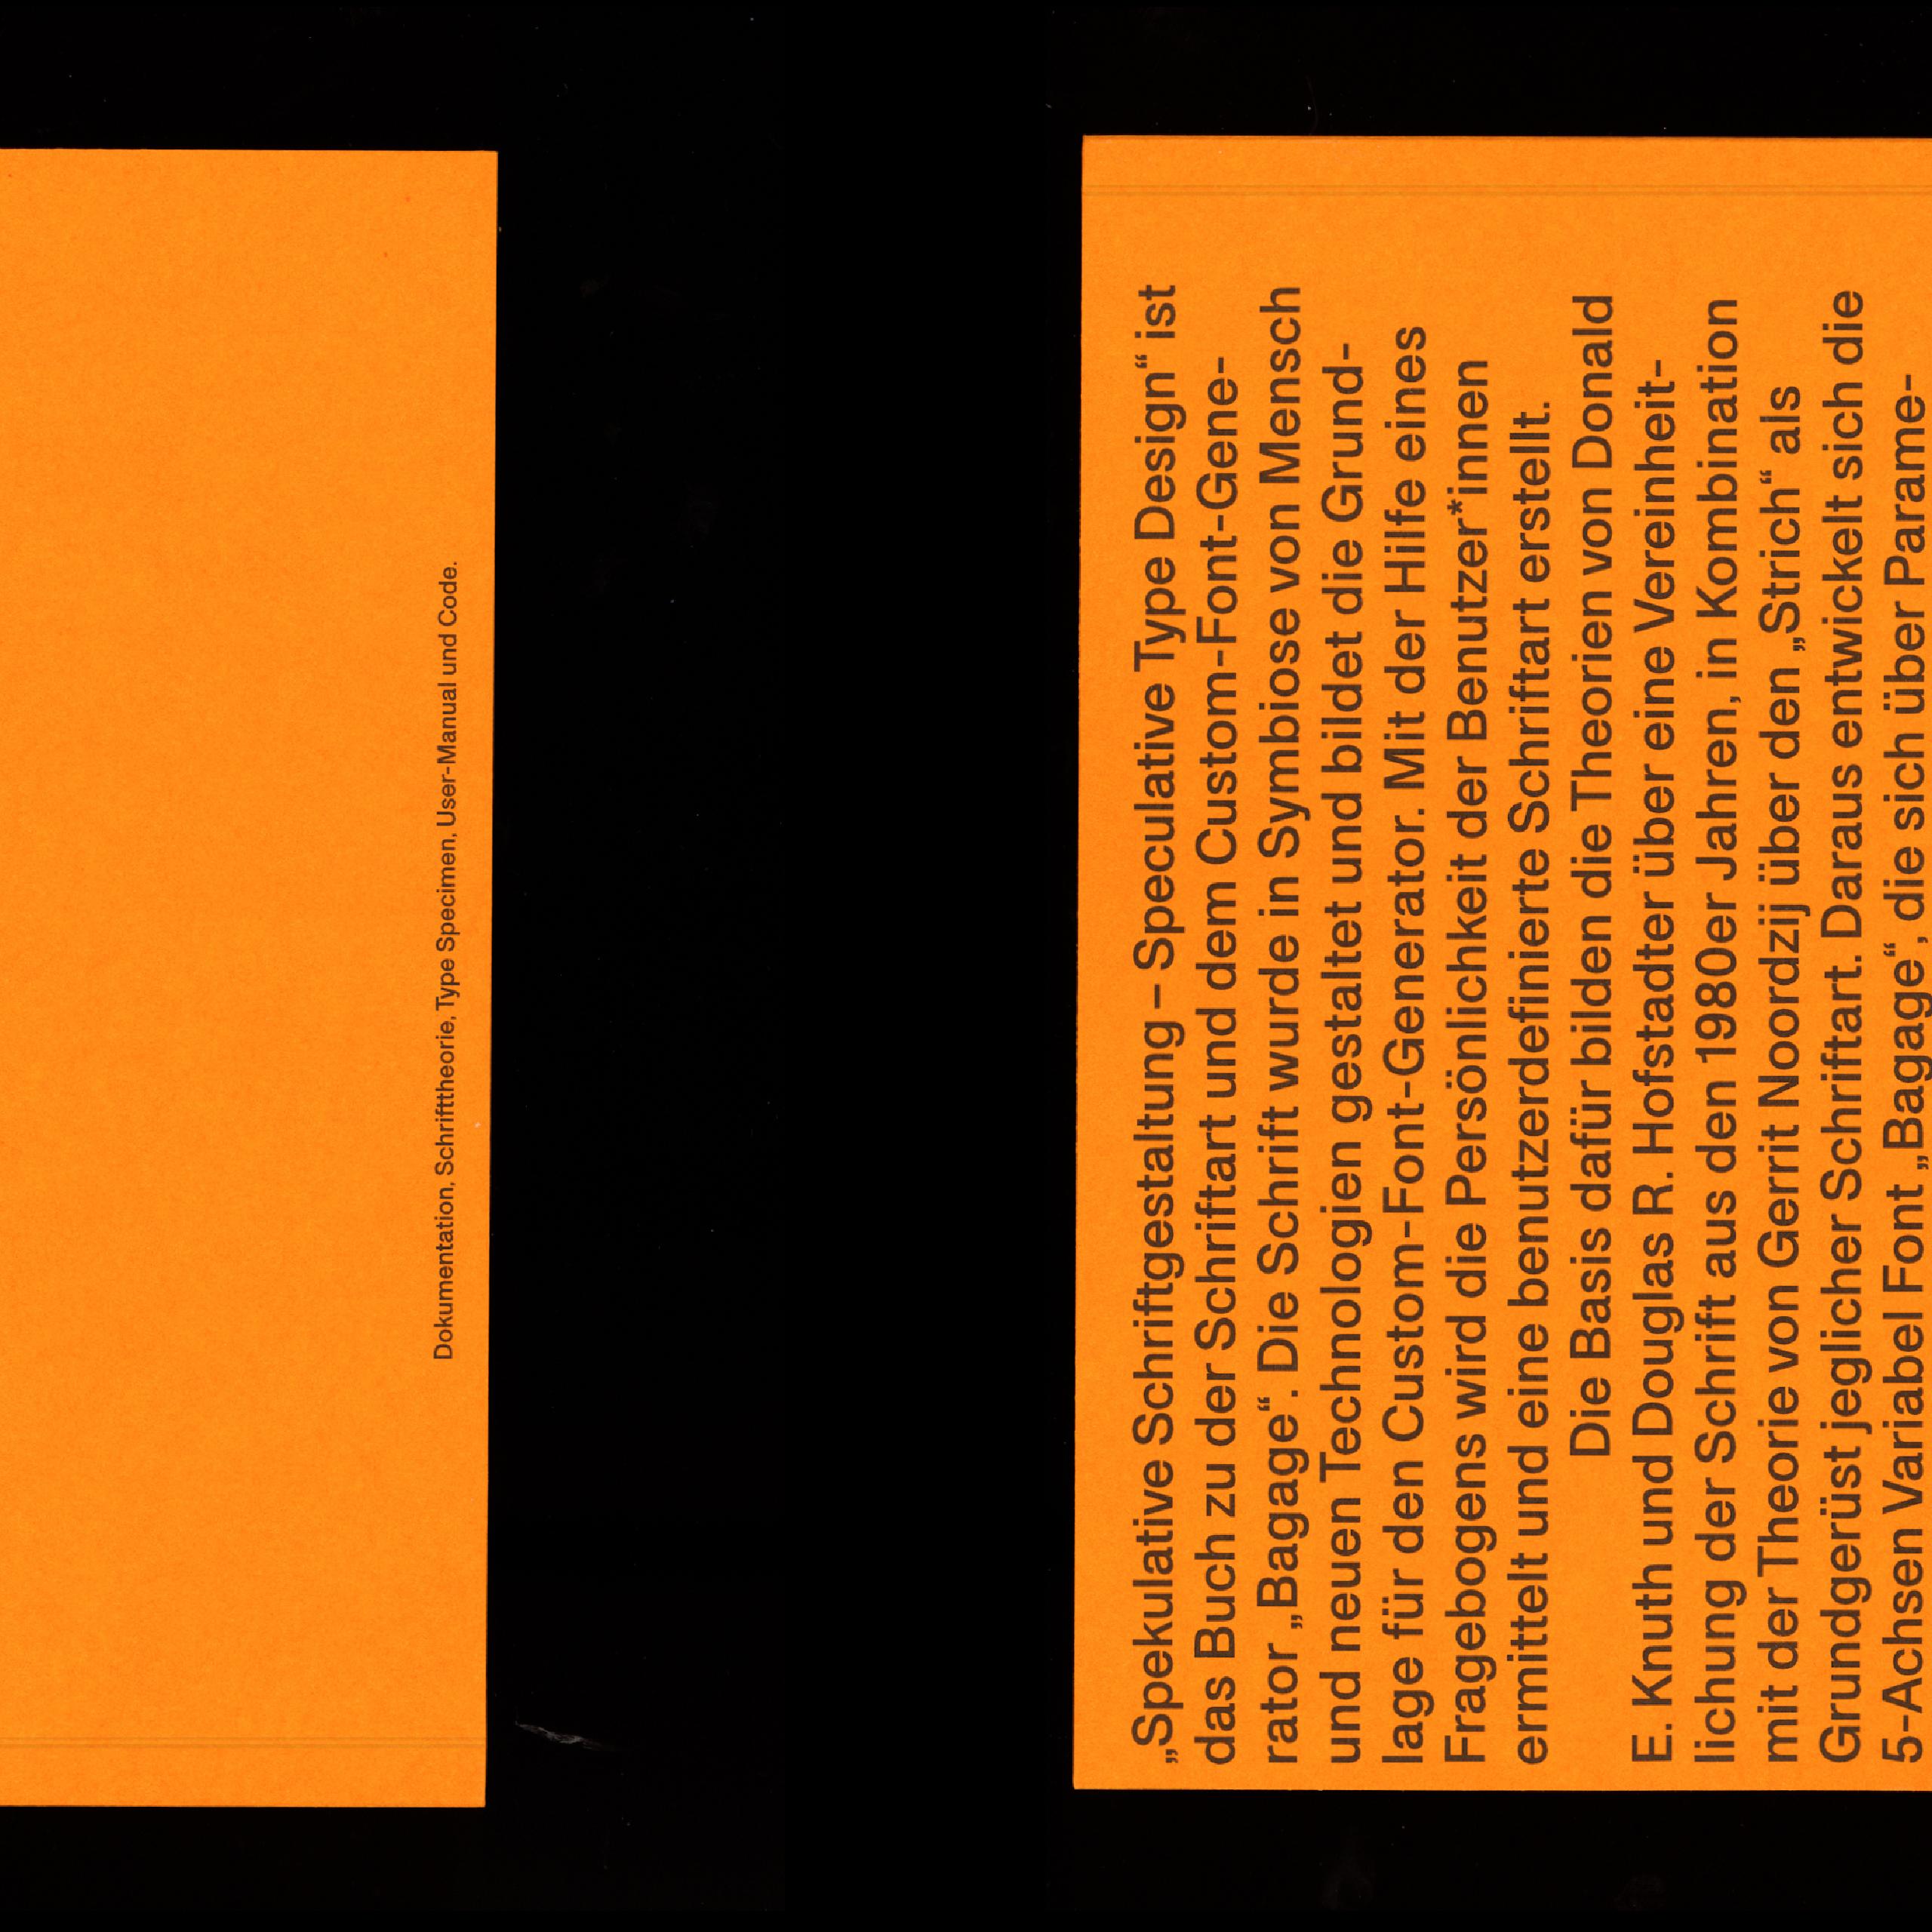 Daniel_Stuhlpfarrer_Spekulative-Schriftgestaltung-Speculative-Type-Design_WEB59